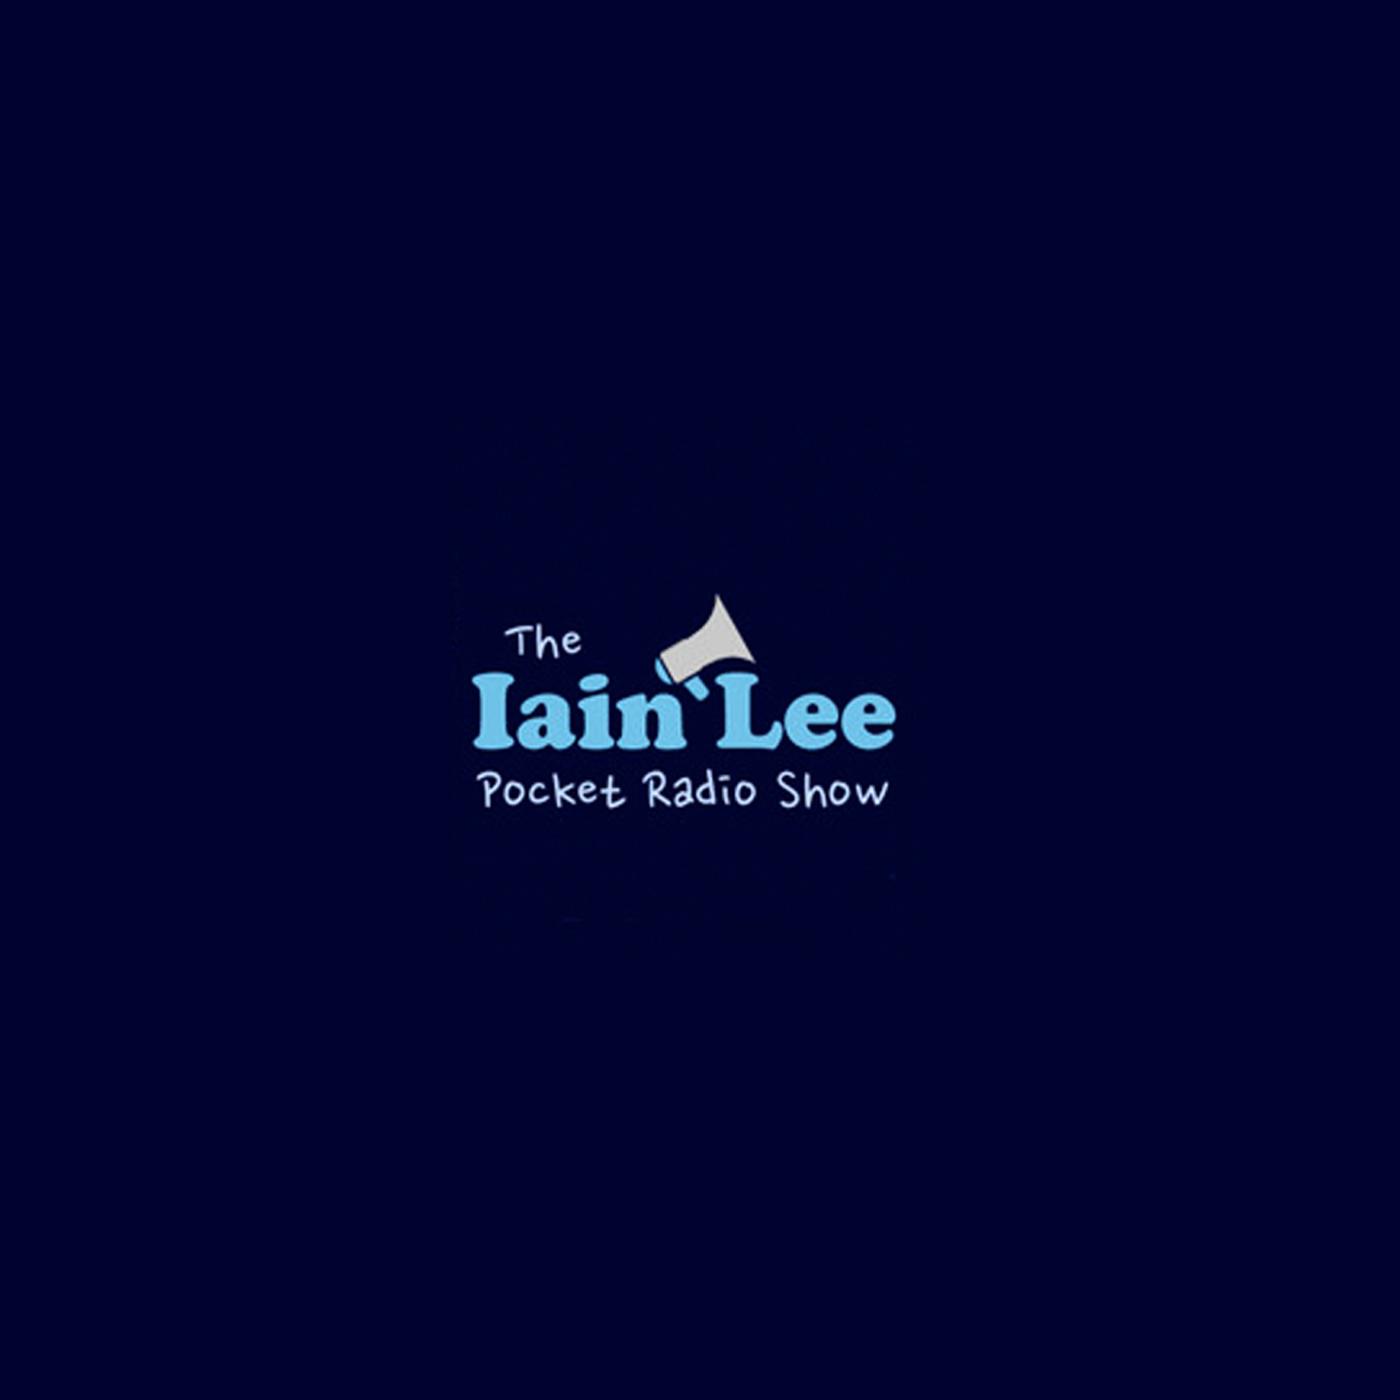 The Iain Lee Pocket Radio Show